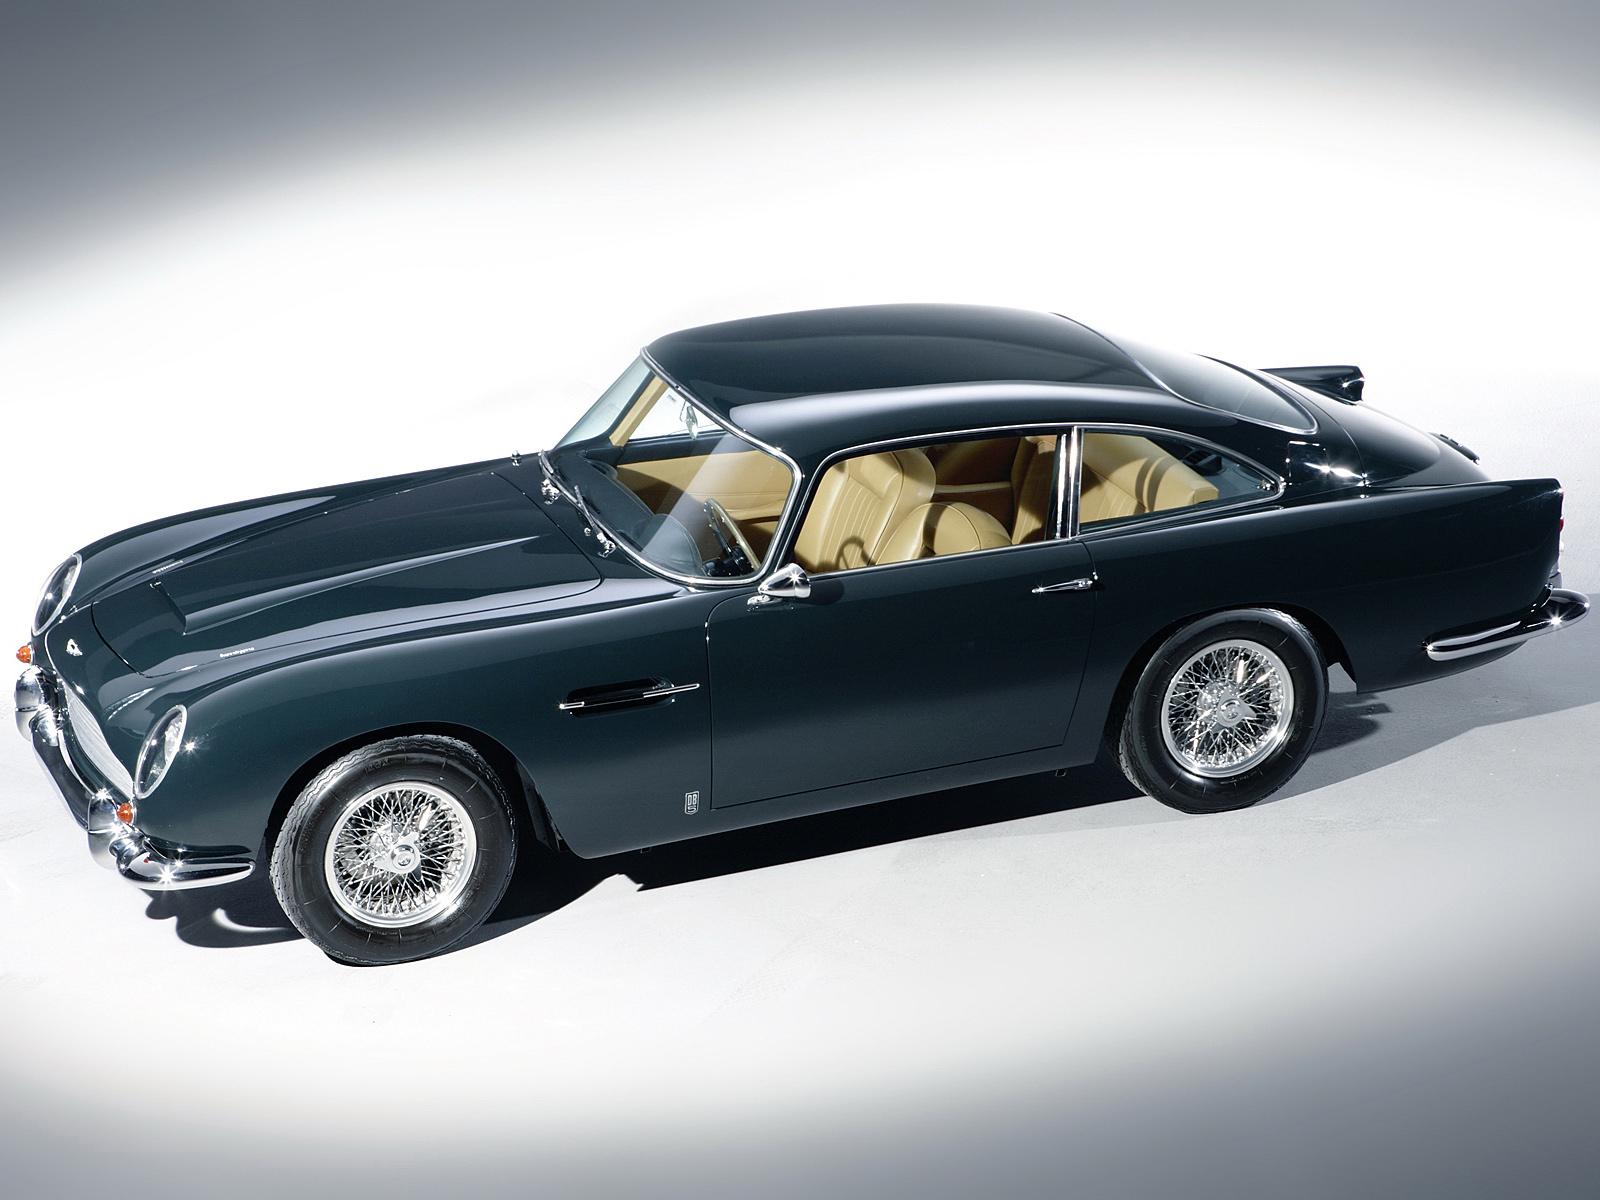 Aston Martin DB5 Vantage Wallpapers Car wallpapers HD 1600x1200